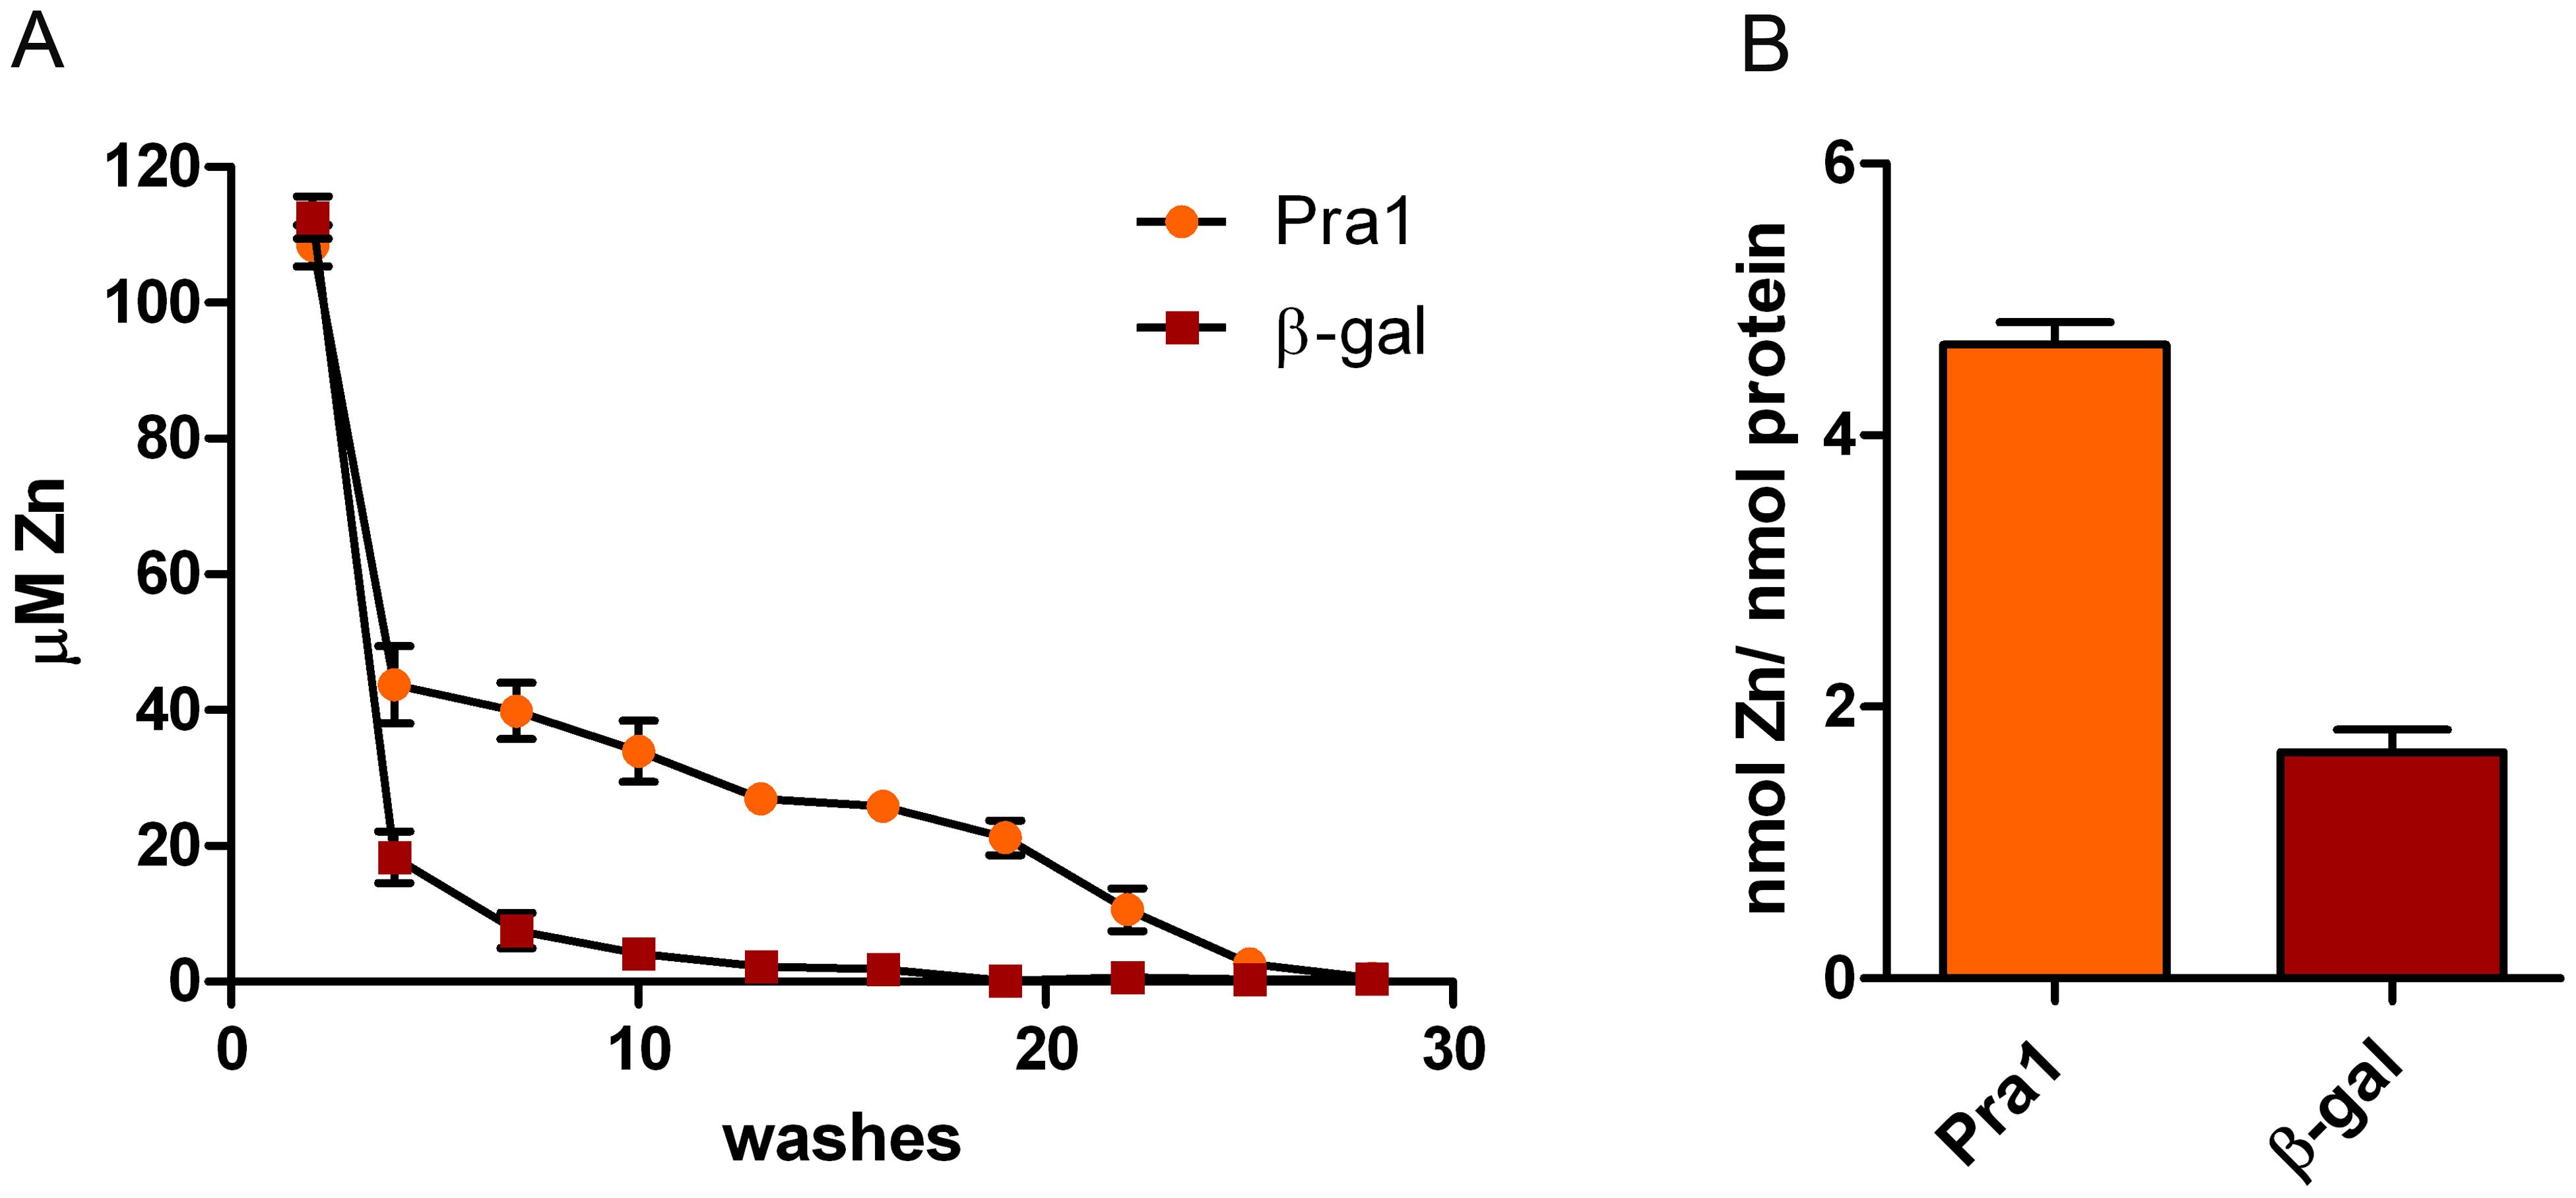 Pra1 is a zinc binding protein.